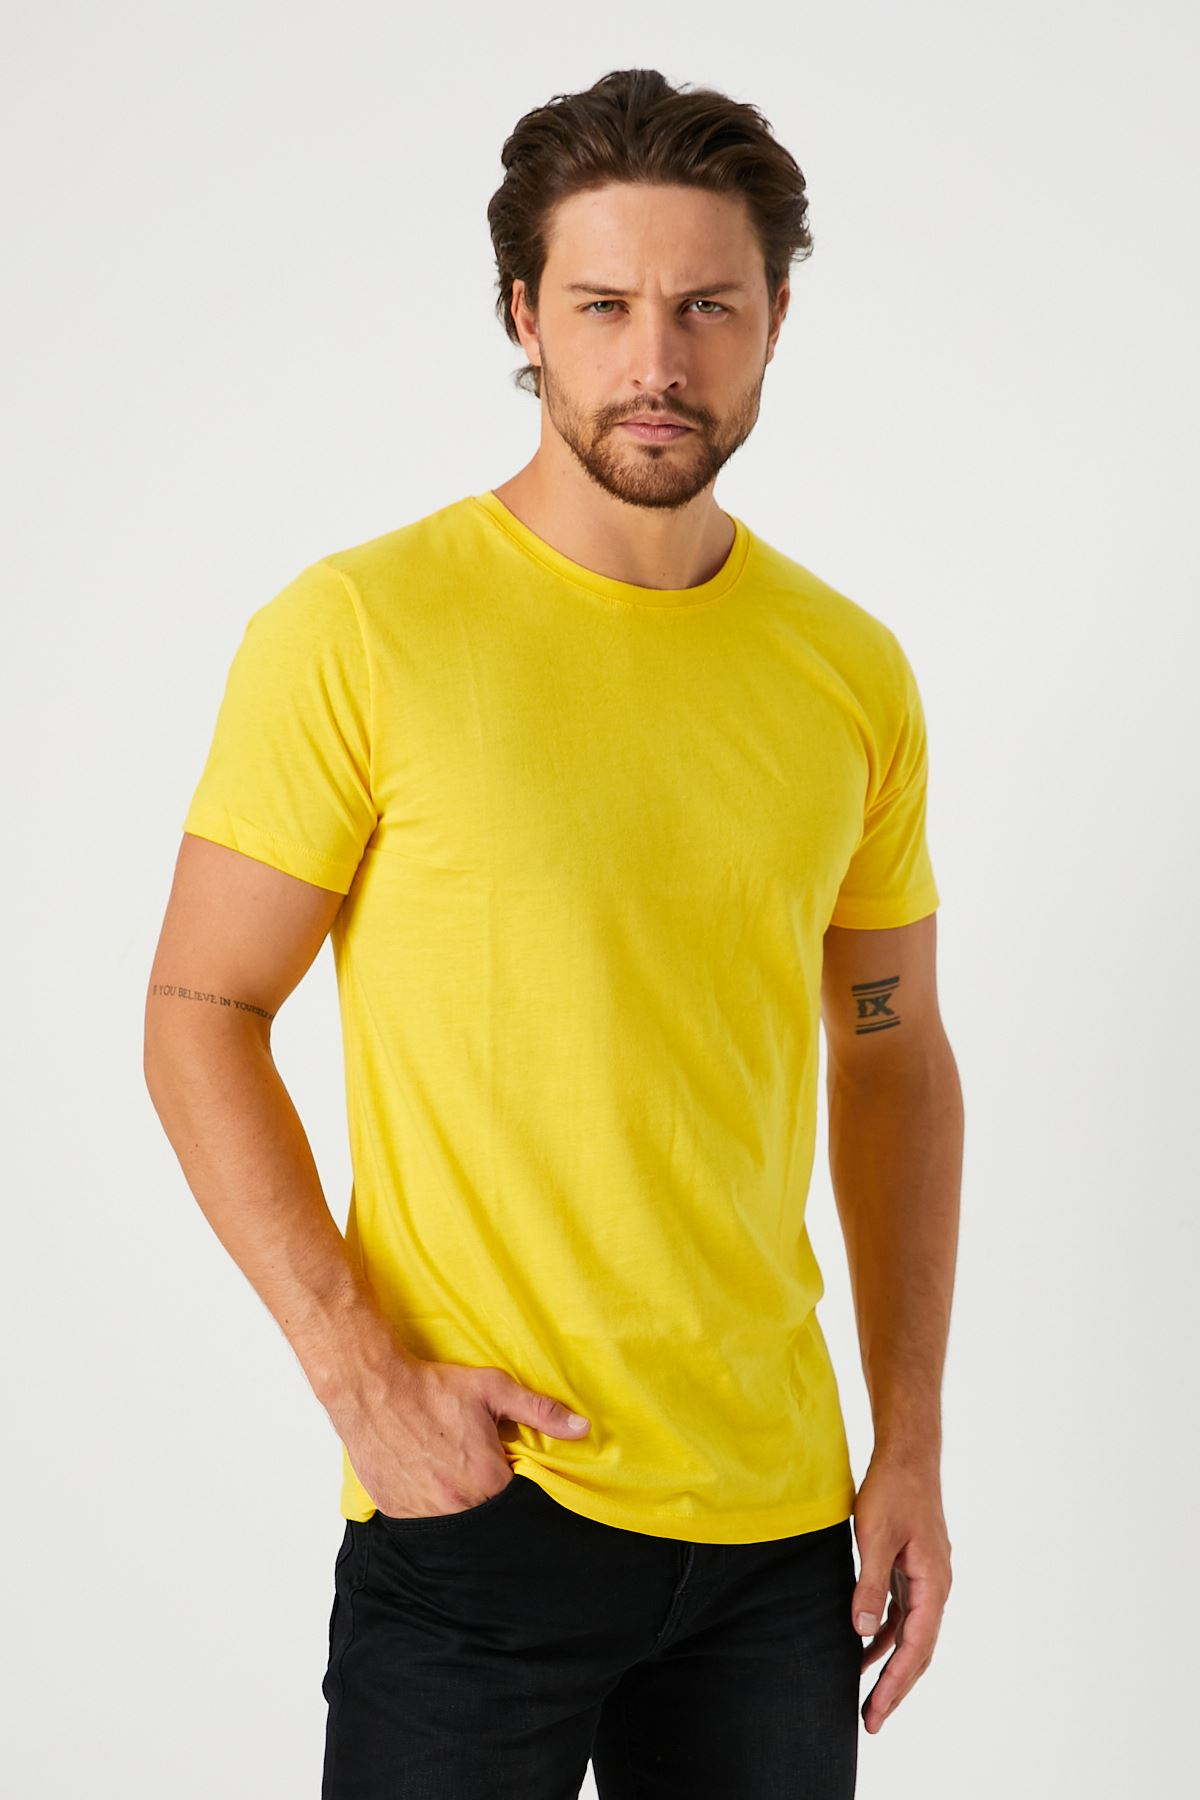 Bisiklet Yaka Bay Sarı T-Shirt